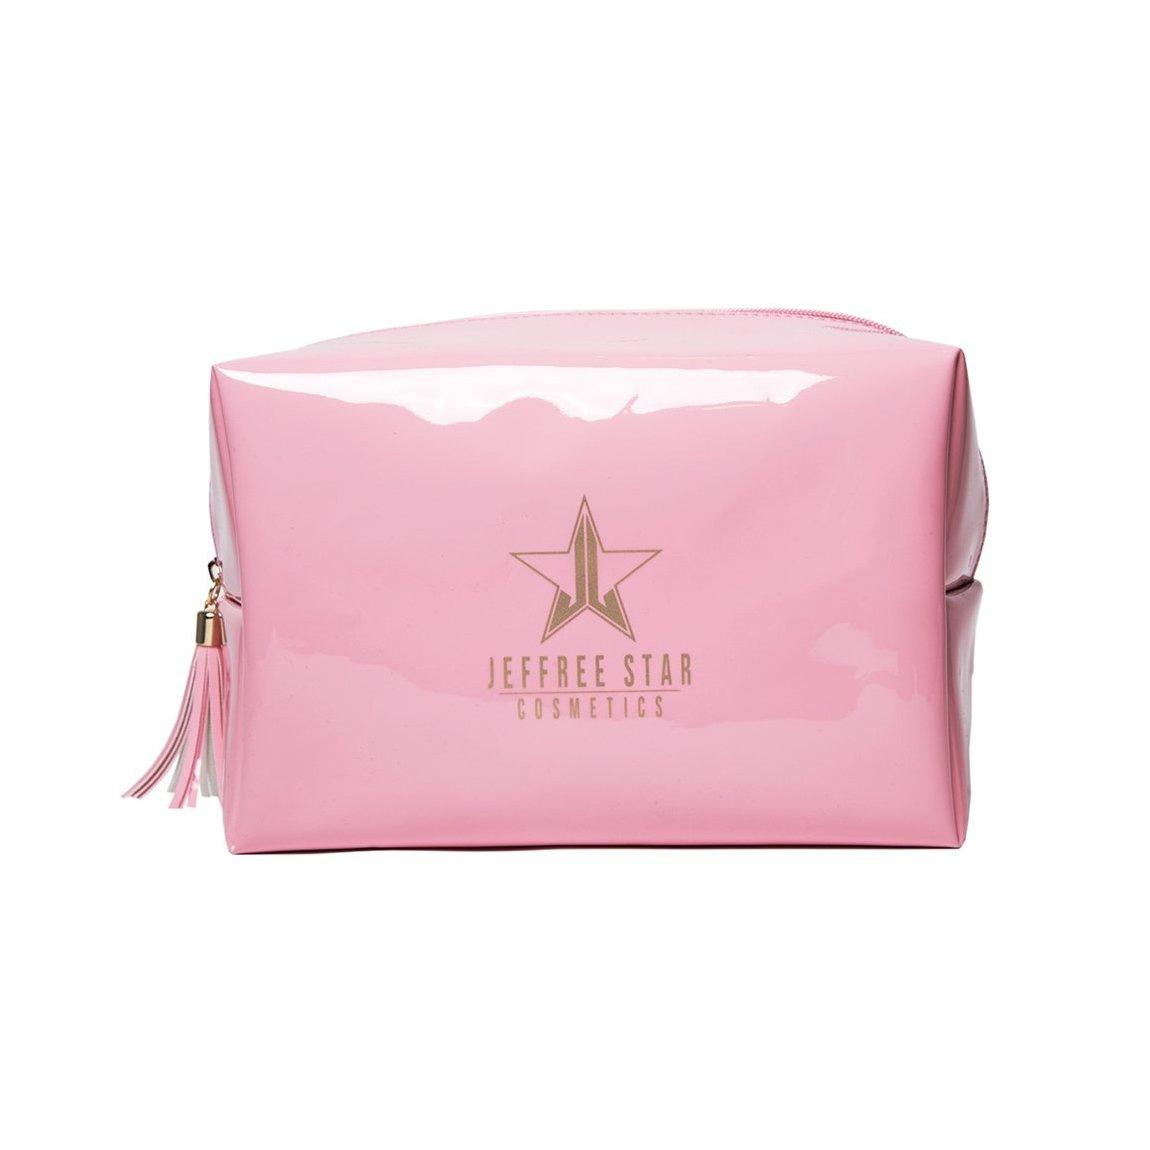 Jeffree Star Cosmetics Baby Pink Large Vinyl Bag Beautylish